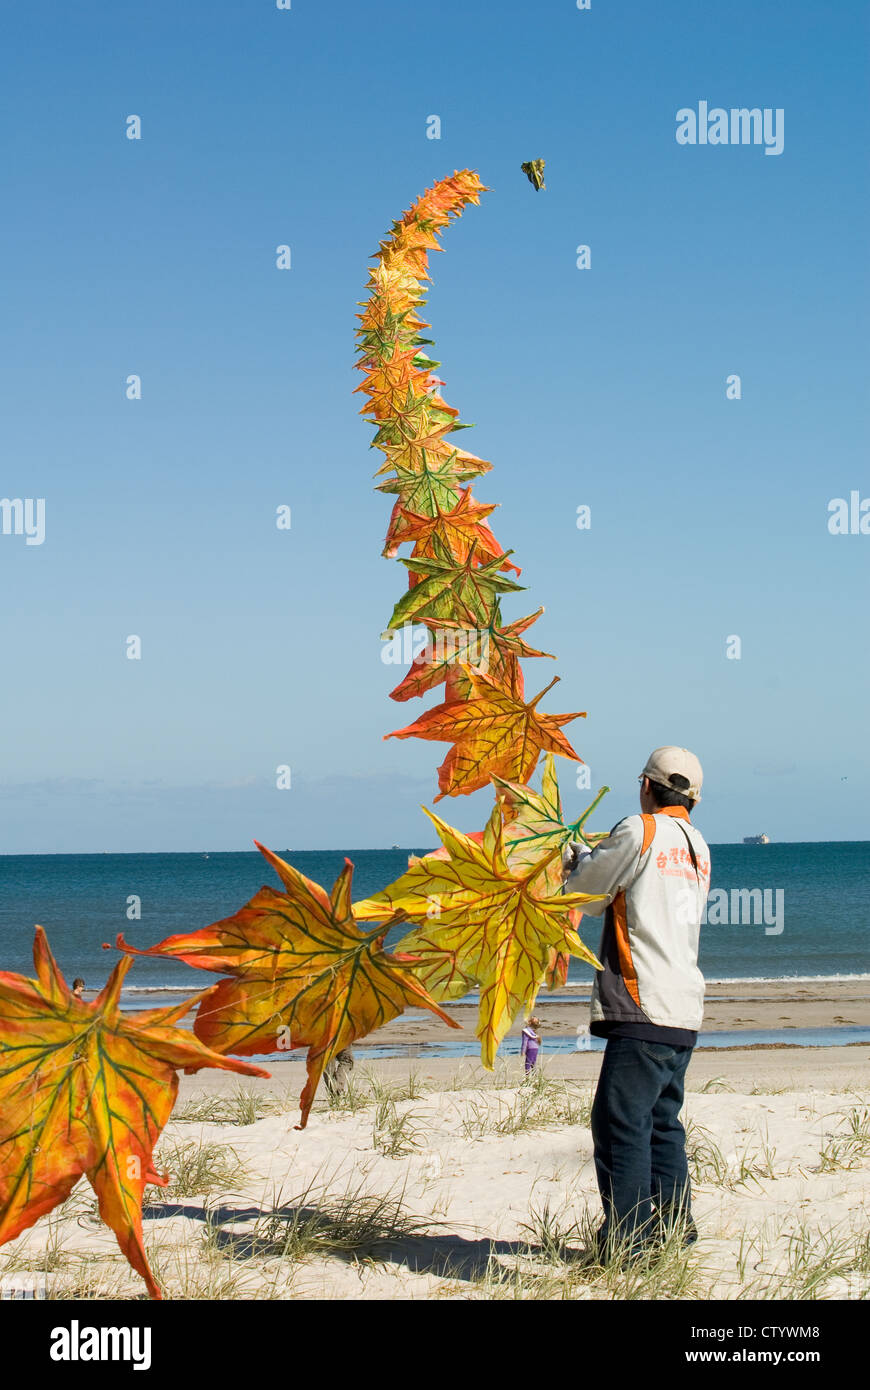 Adelaida Kite Festival celebrado anualmente, Semaphore Beach, Australia del Sur. Imagen De Stock